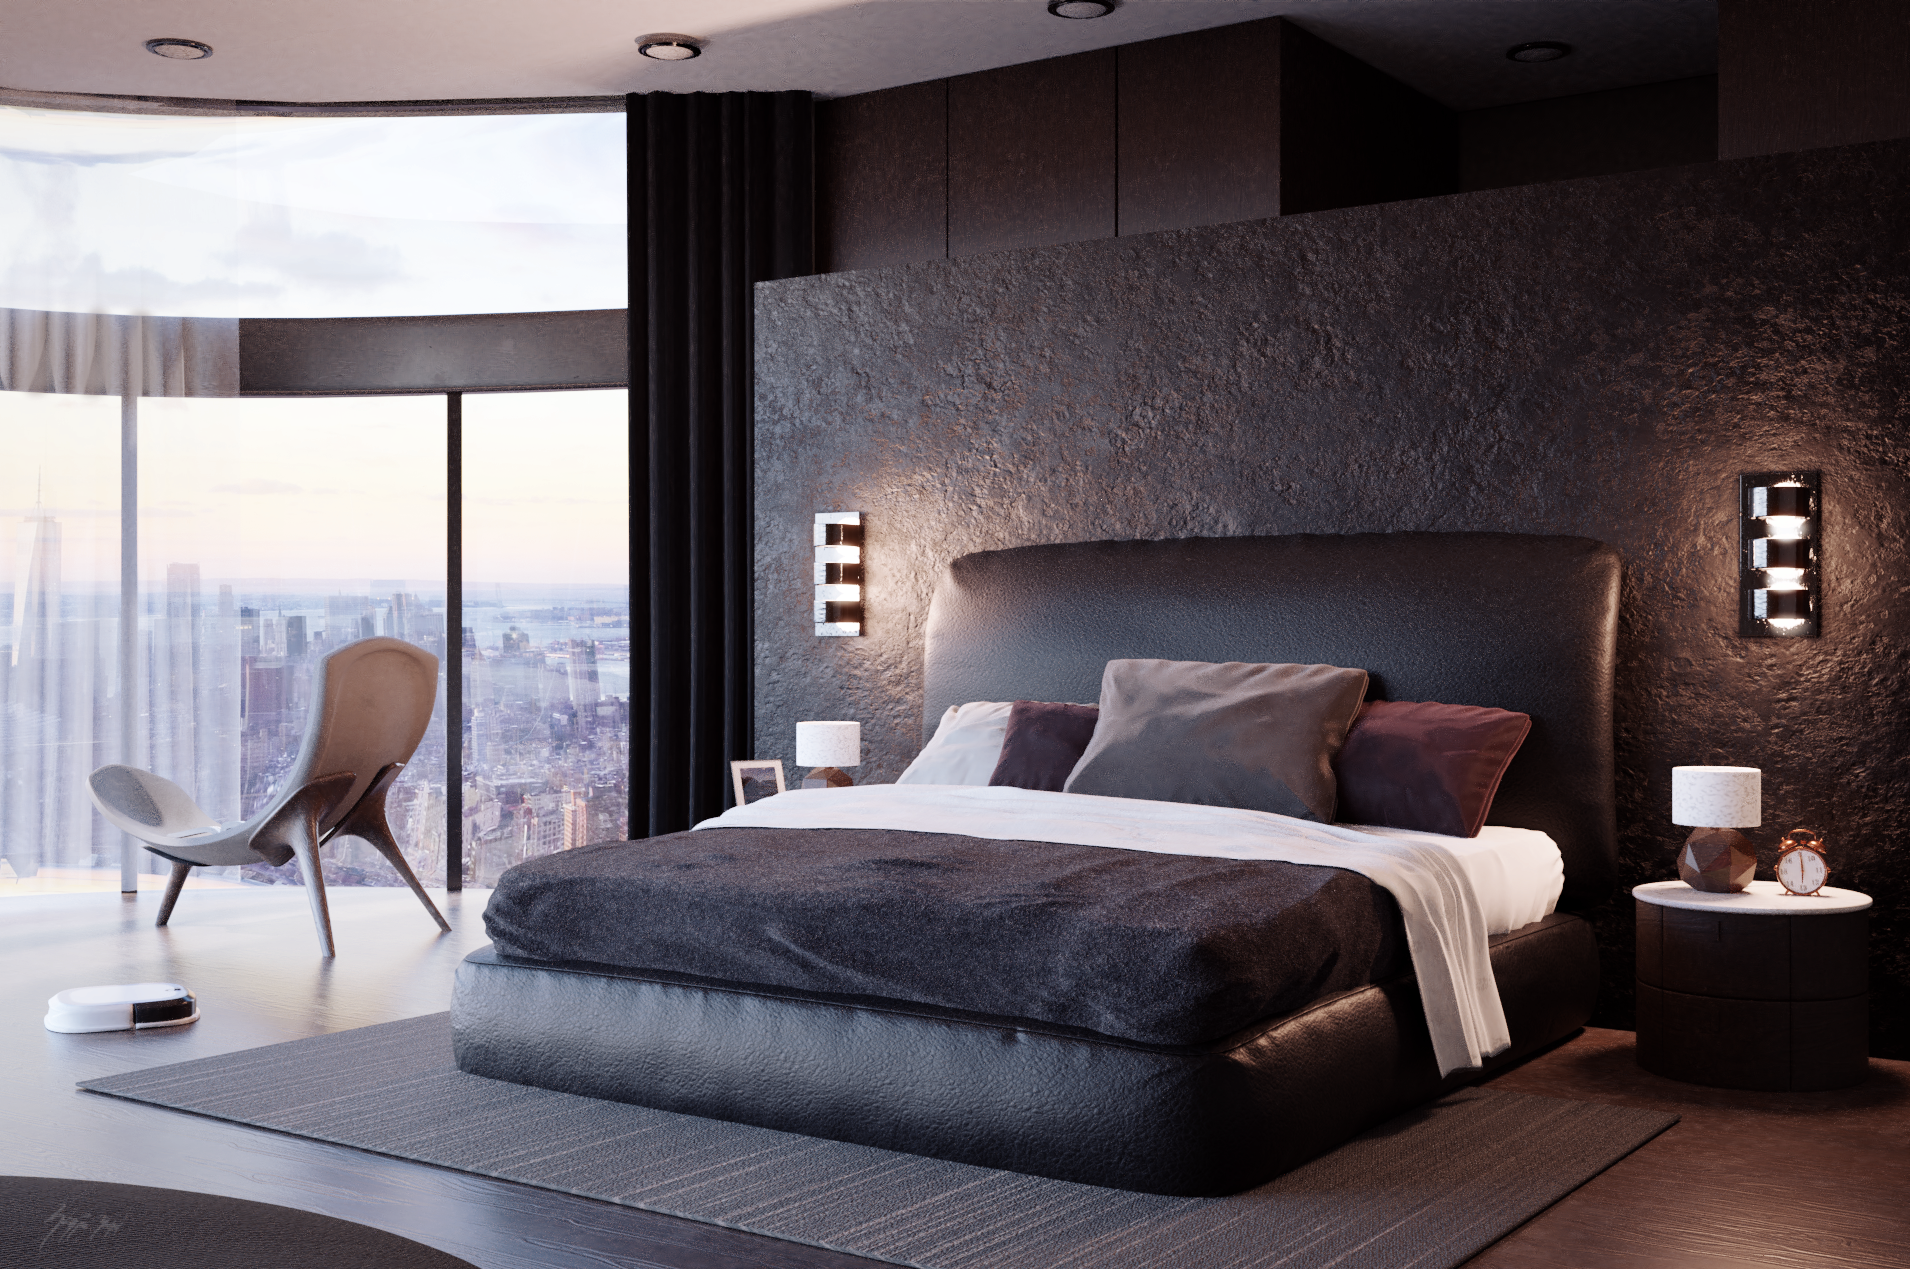 Hotel Room ArchViz by Icesturm